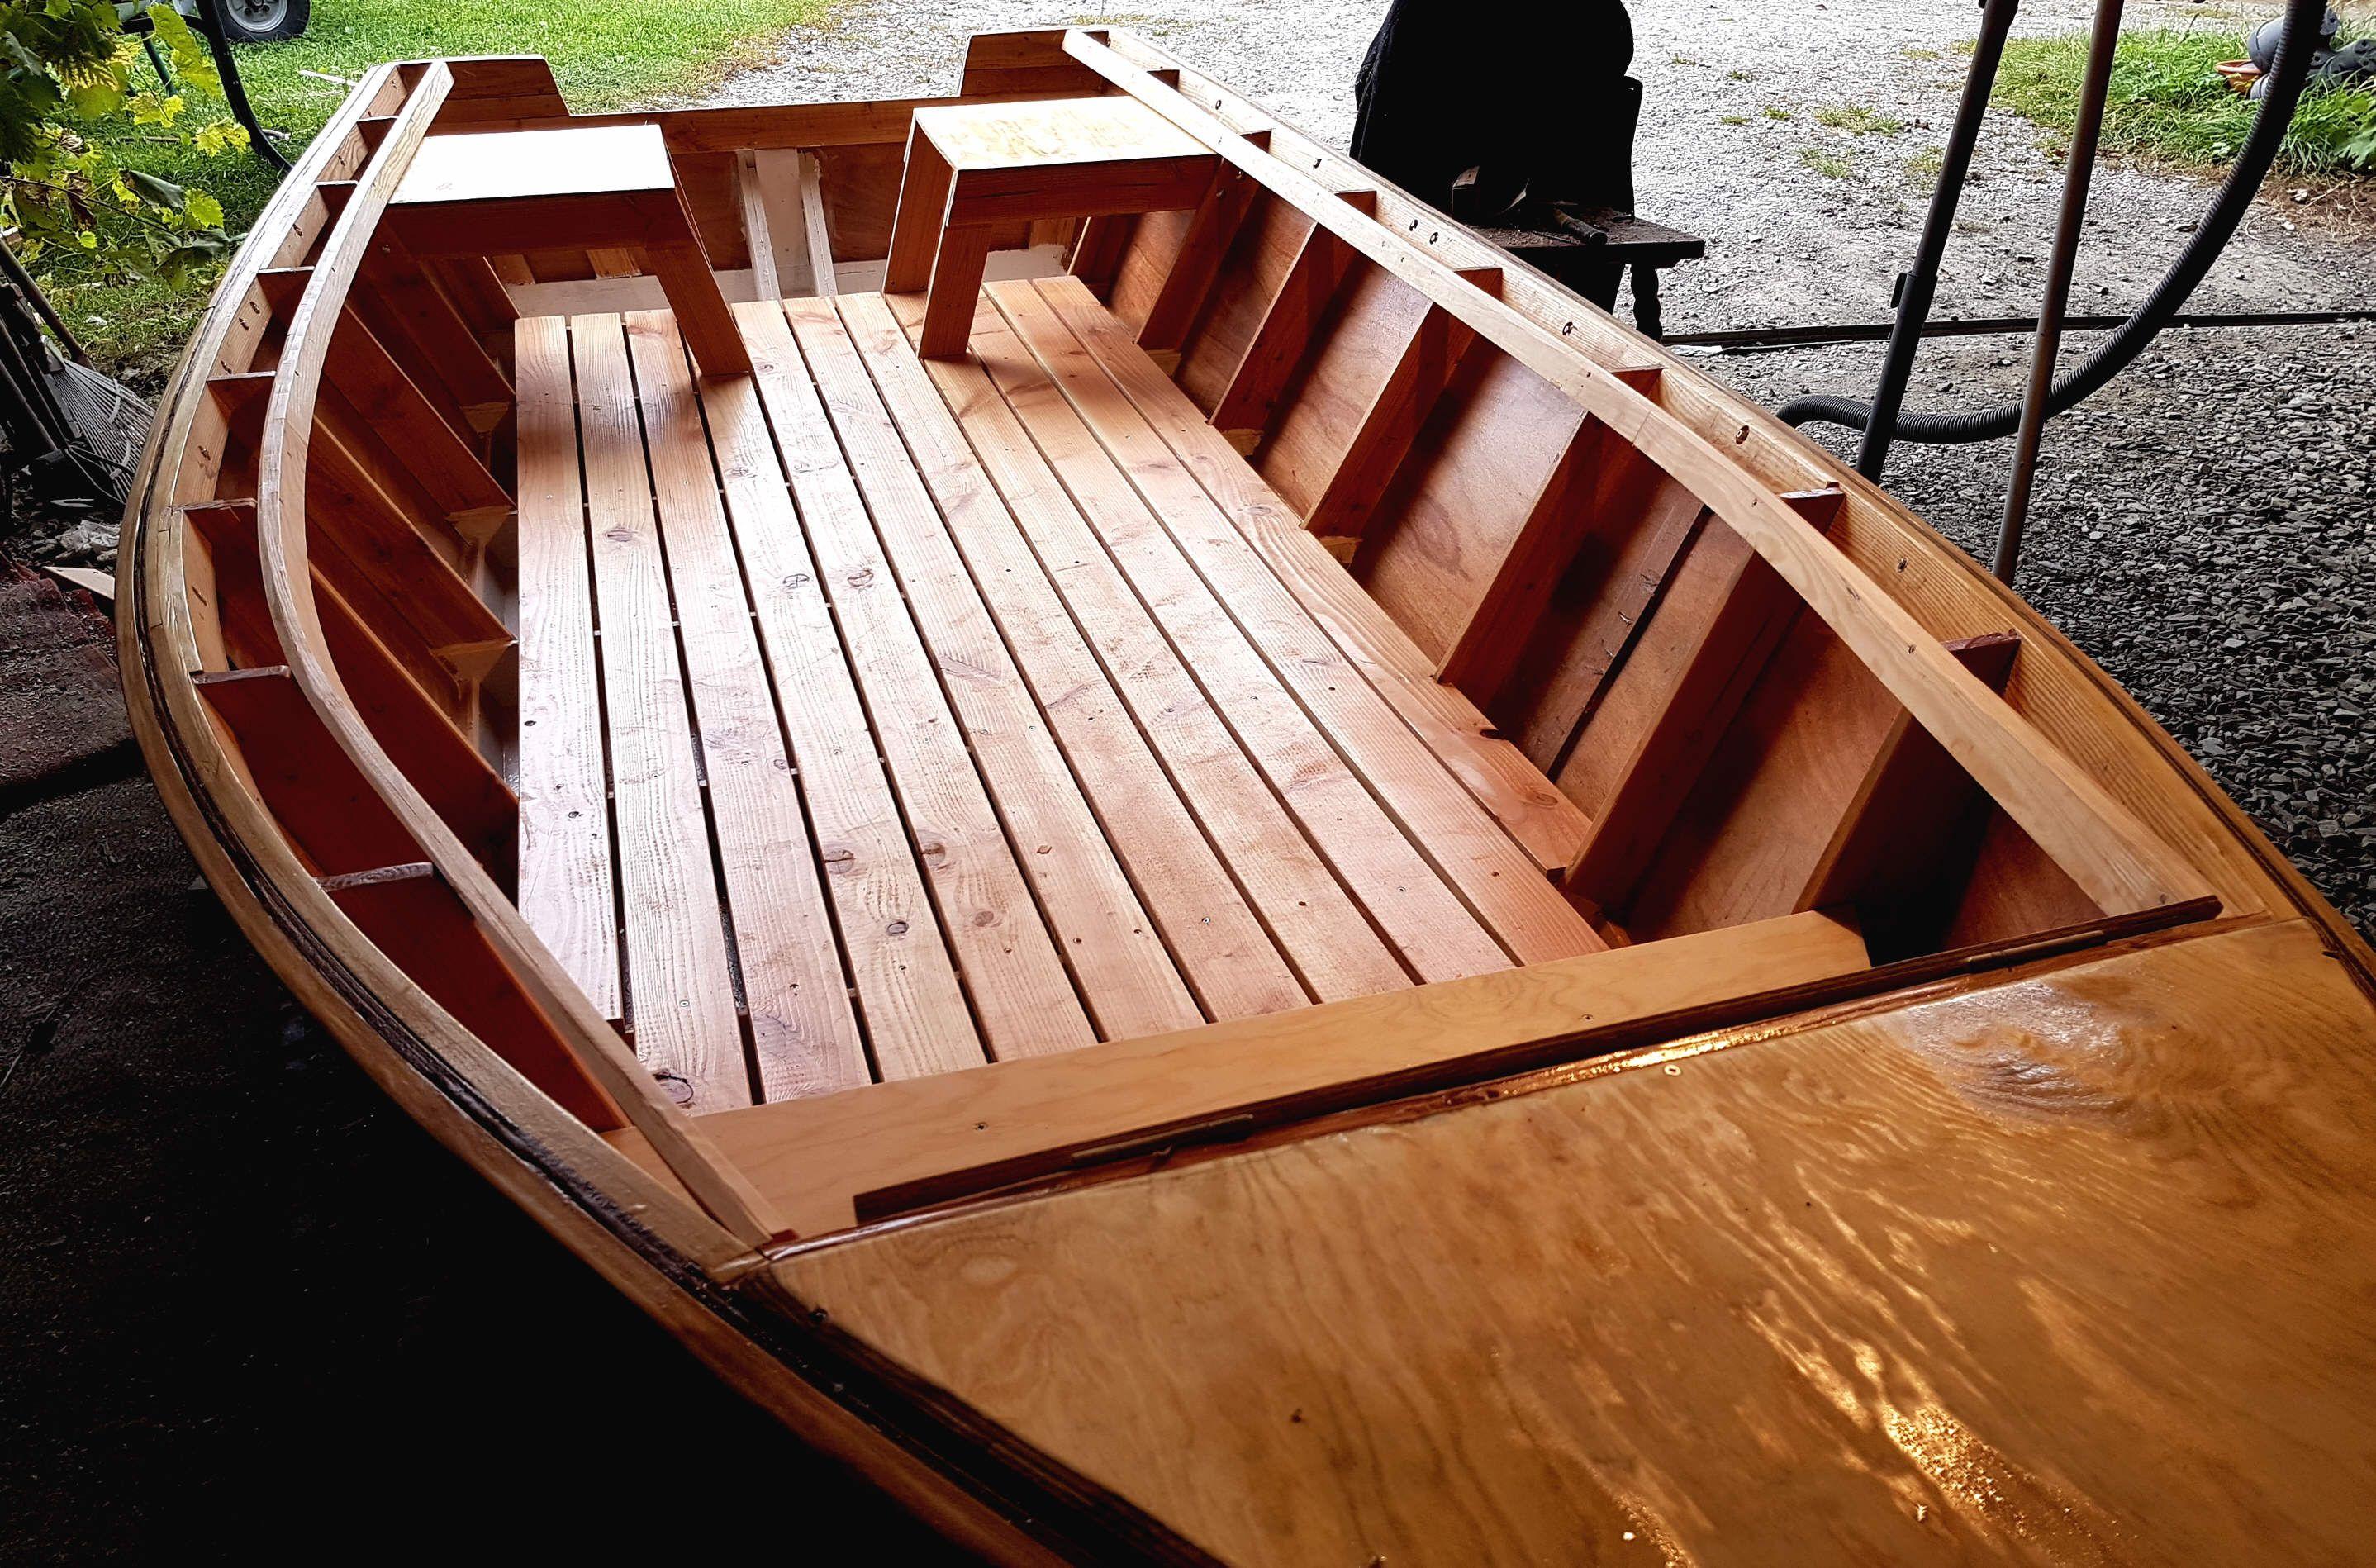 Wood Boat Seneca Pacific Power Dory Plans Wooden Boat Building Wooden Boat Plans Boat Building